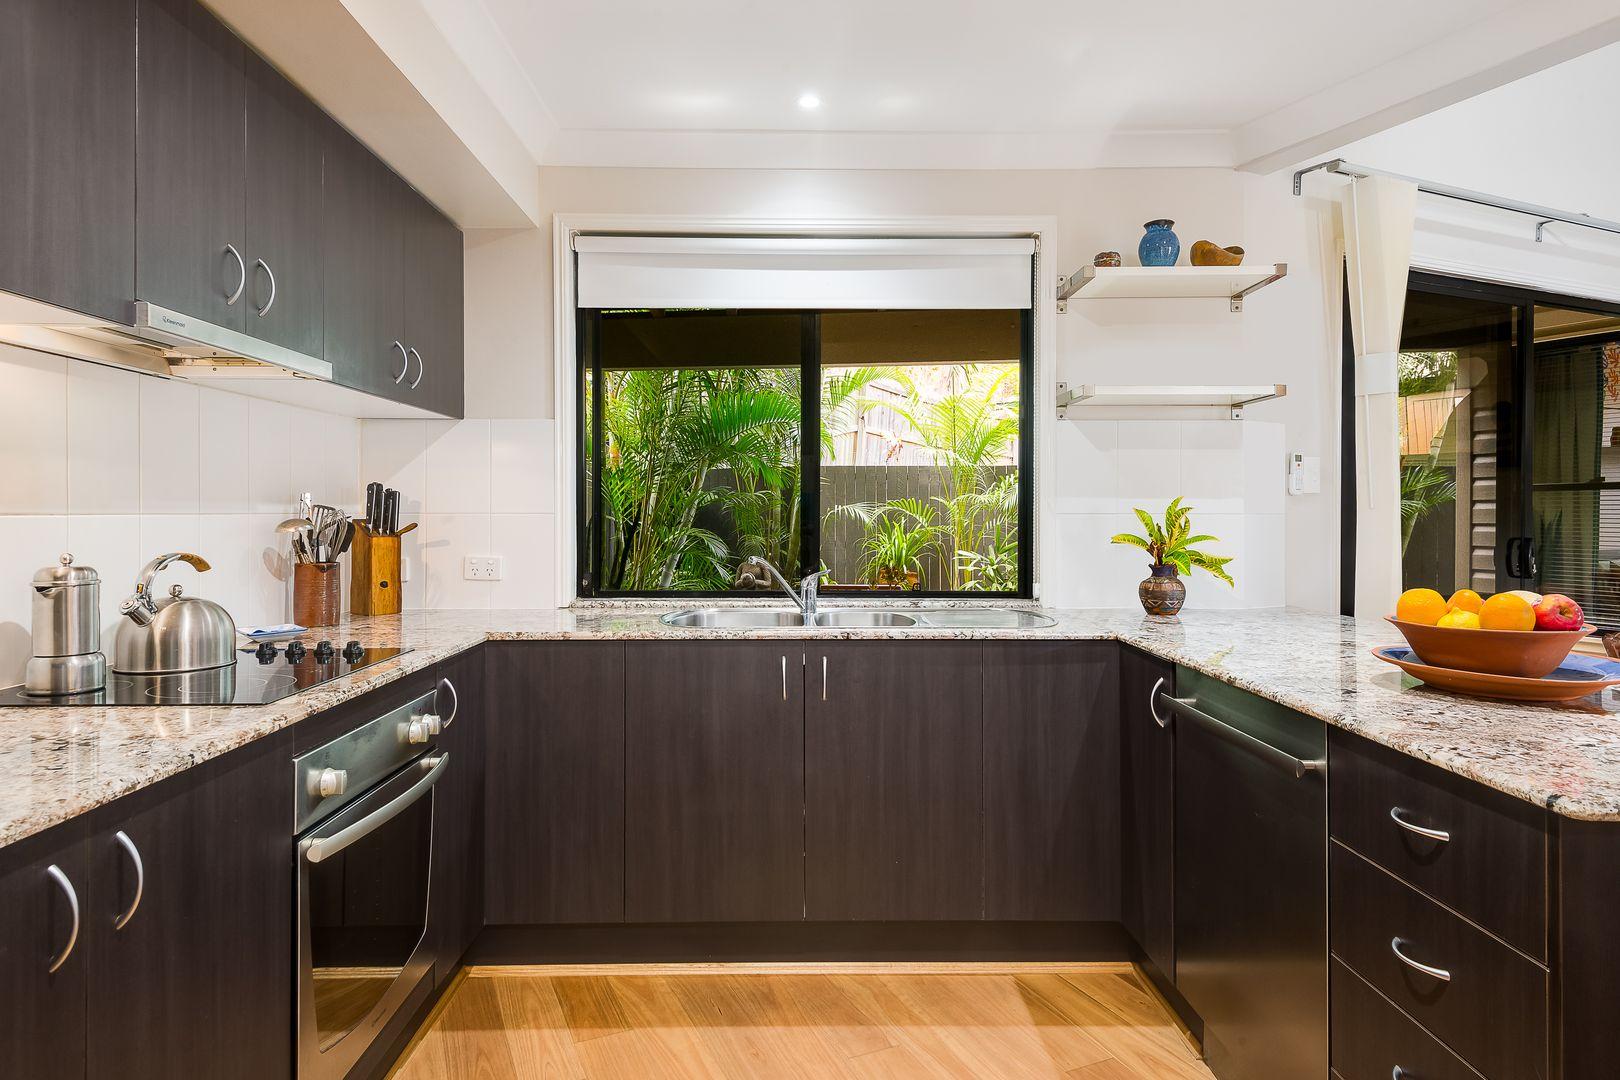 9/976 Samford  Road, Keperra QLD 4054, Image 2